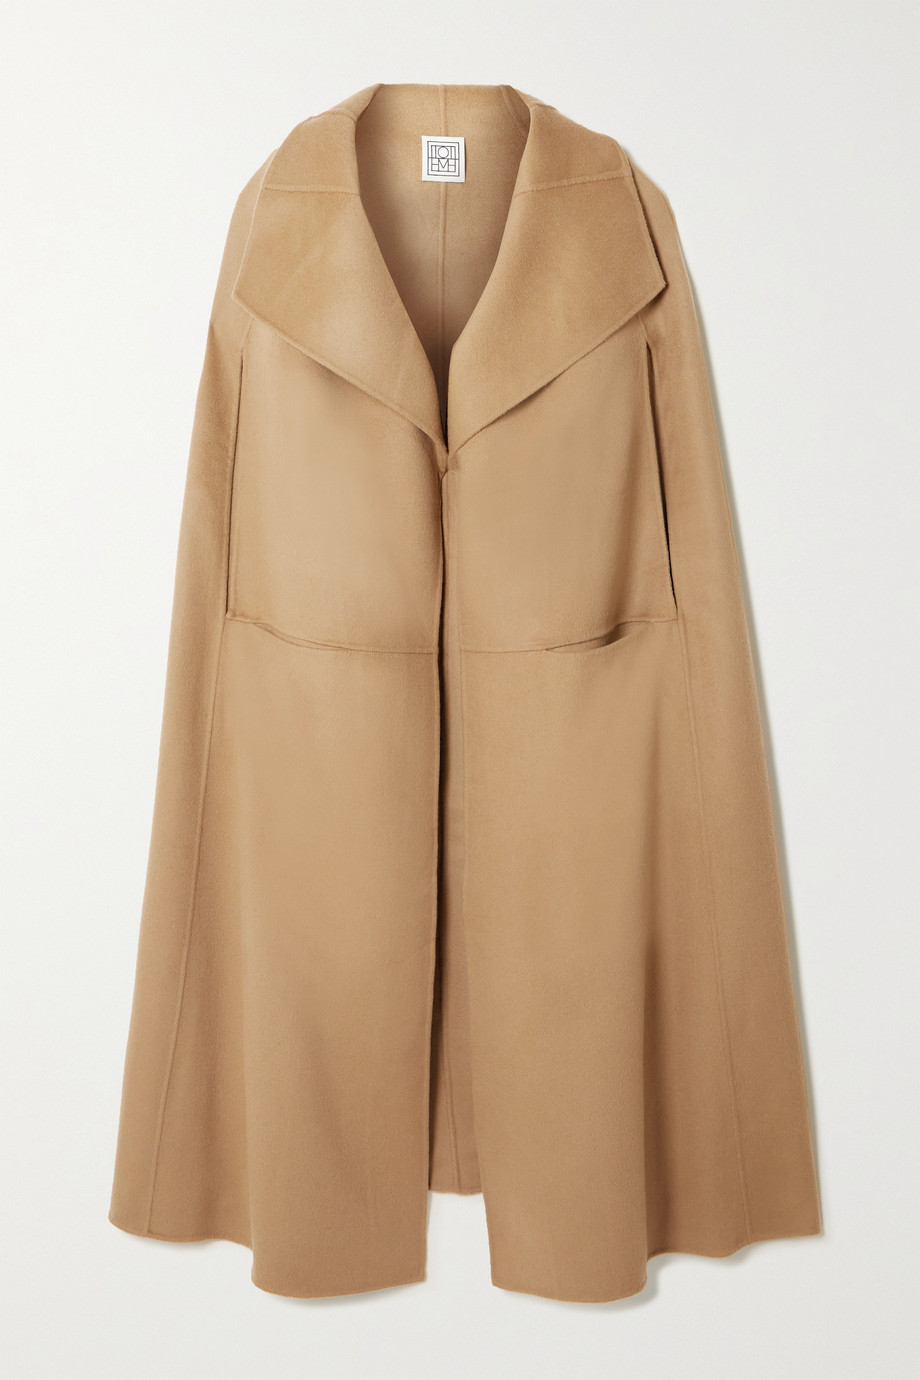 Totême Signature wool and cashmere-blend cape